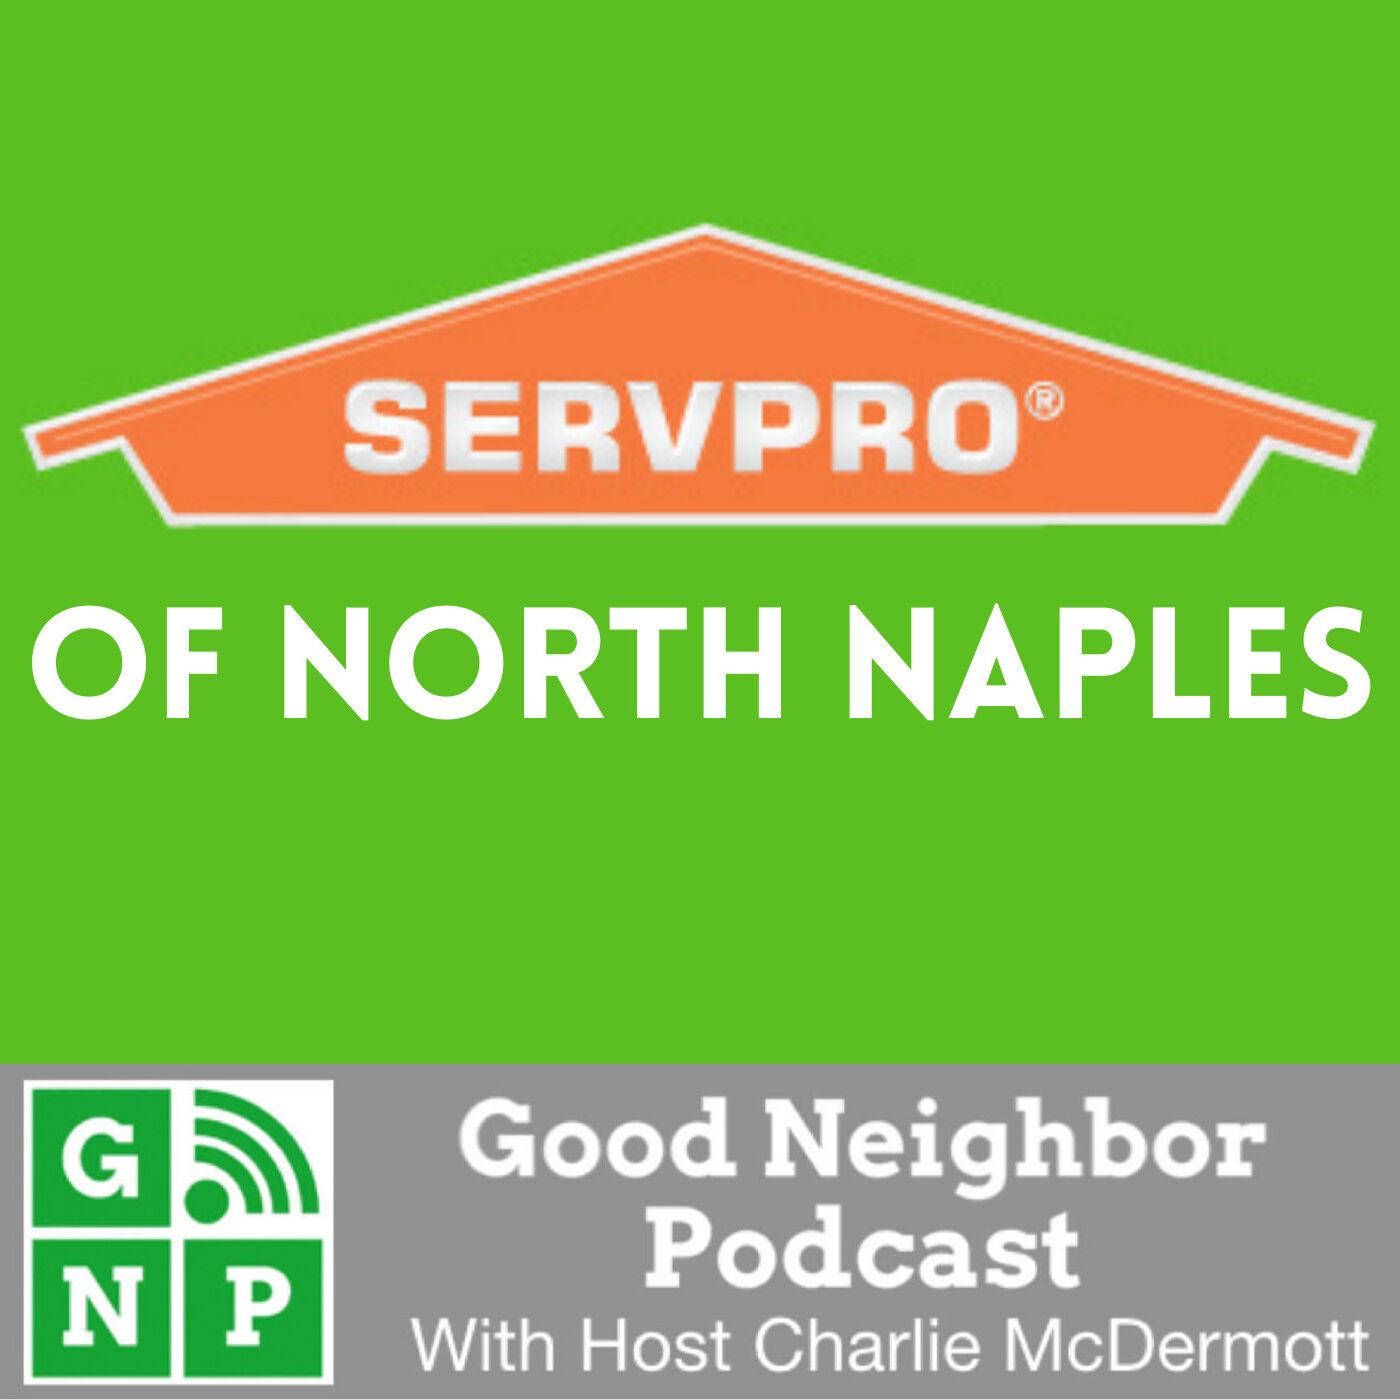 EP #459: SERVPRO of North Naples with Heather VanBrummelen